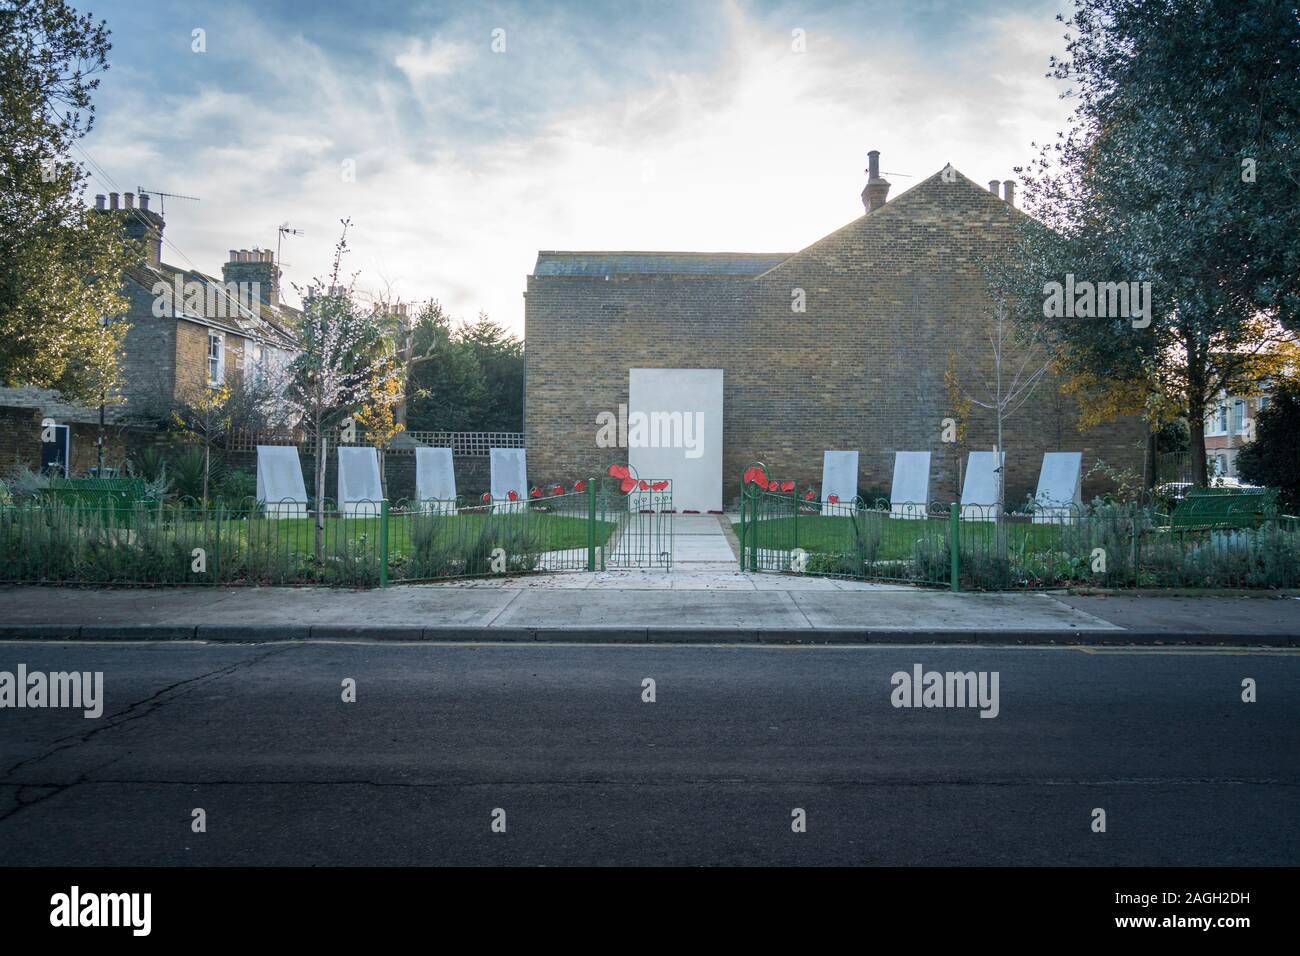 The war memorial in the medieval market town of  Faversham, Kent, UK Stock Photo